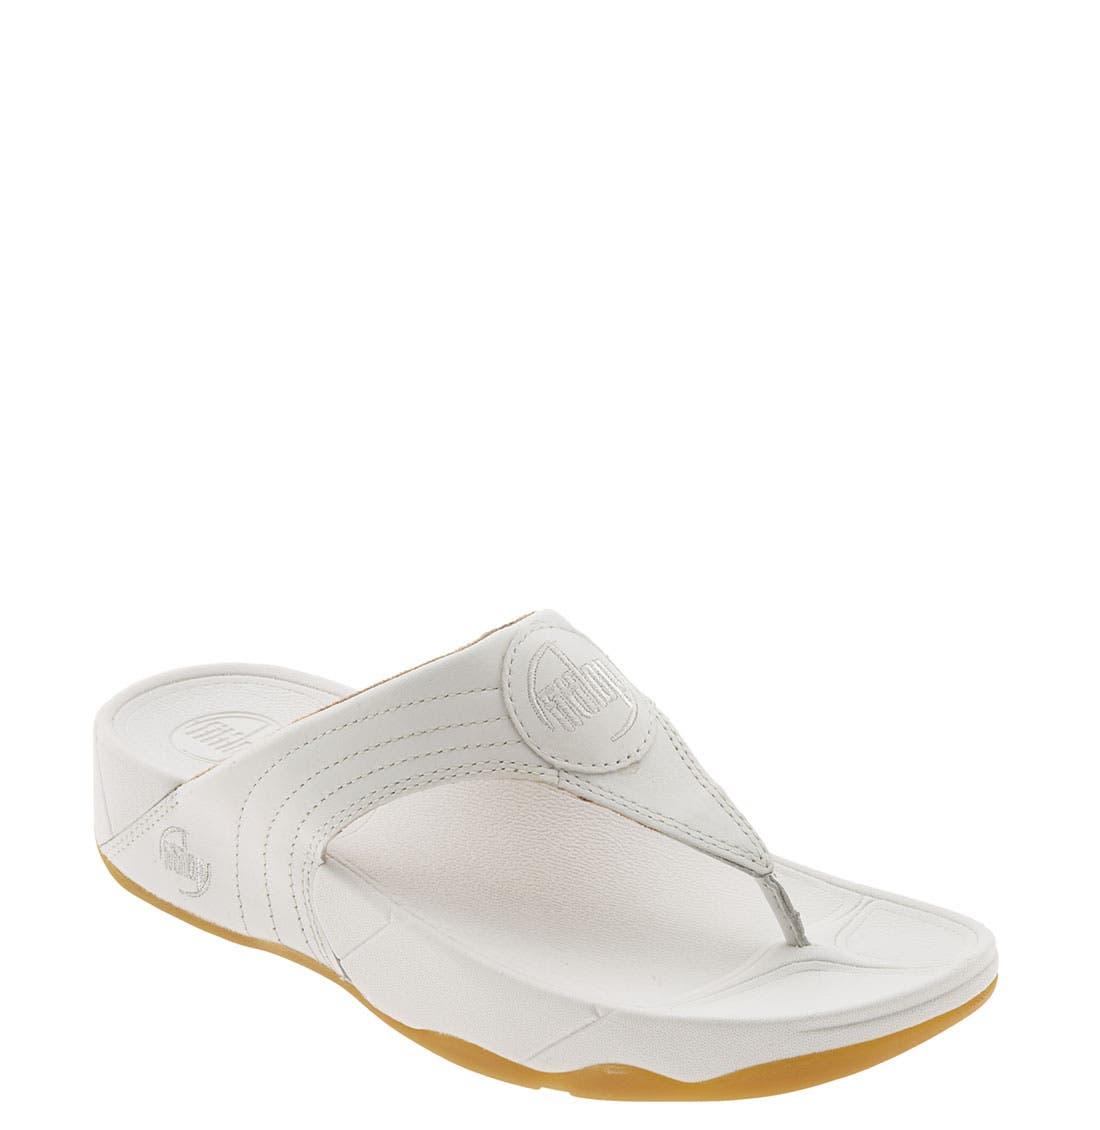 Main Image - FitFlop 'Walkstar III™' Sandal